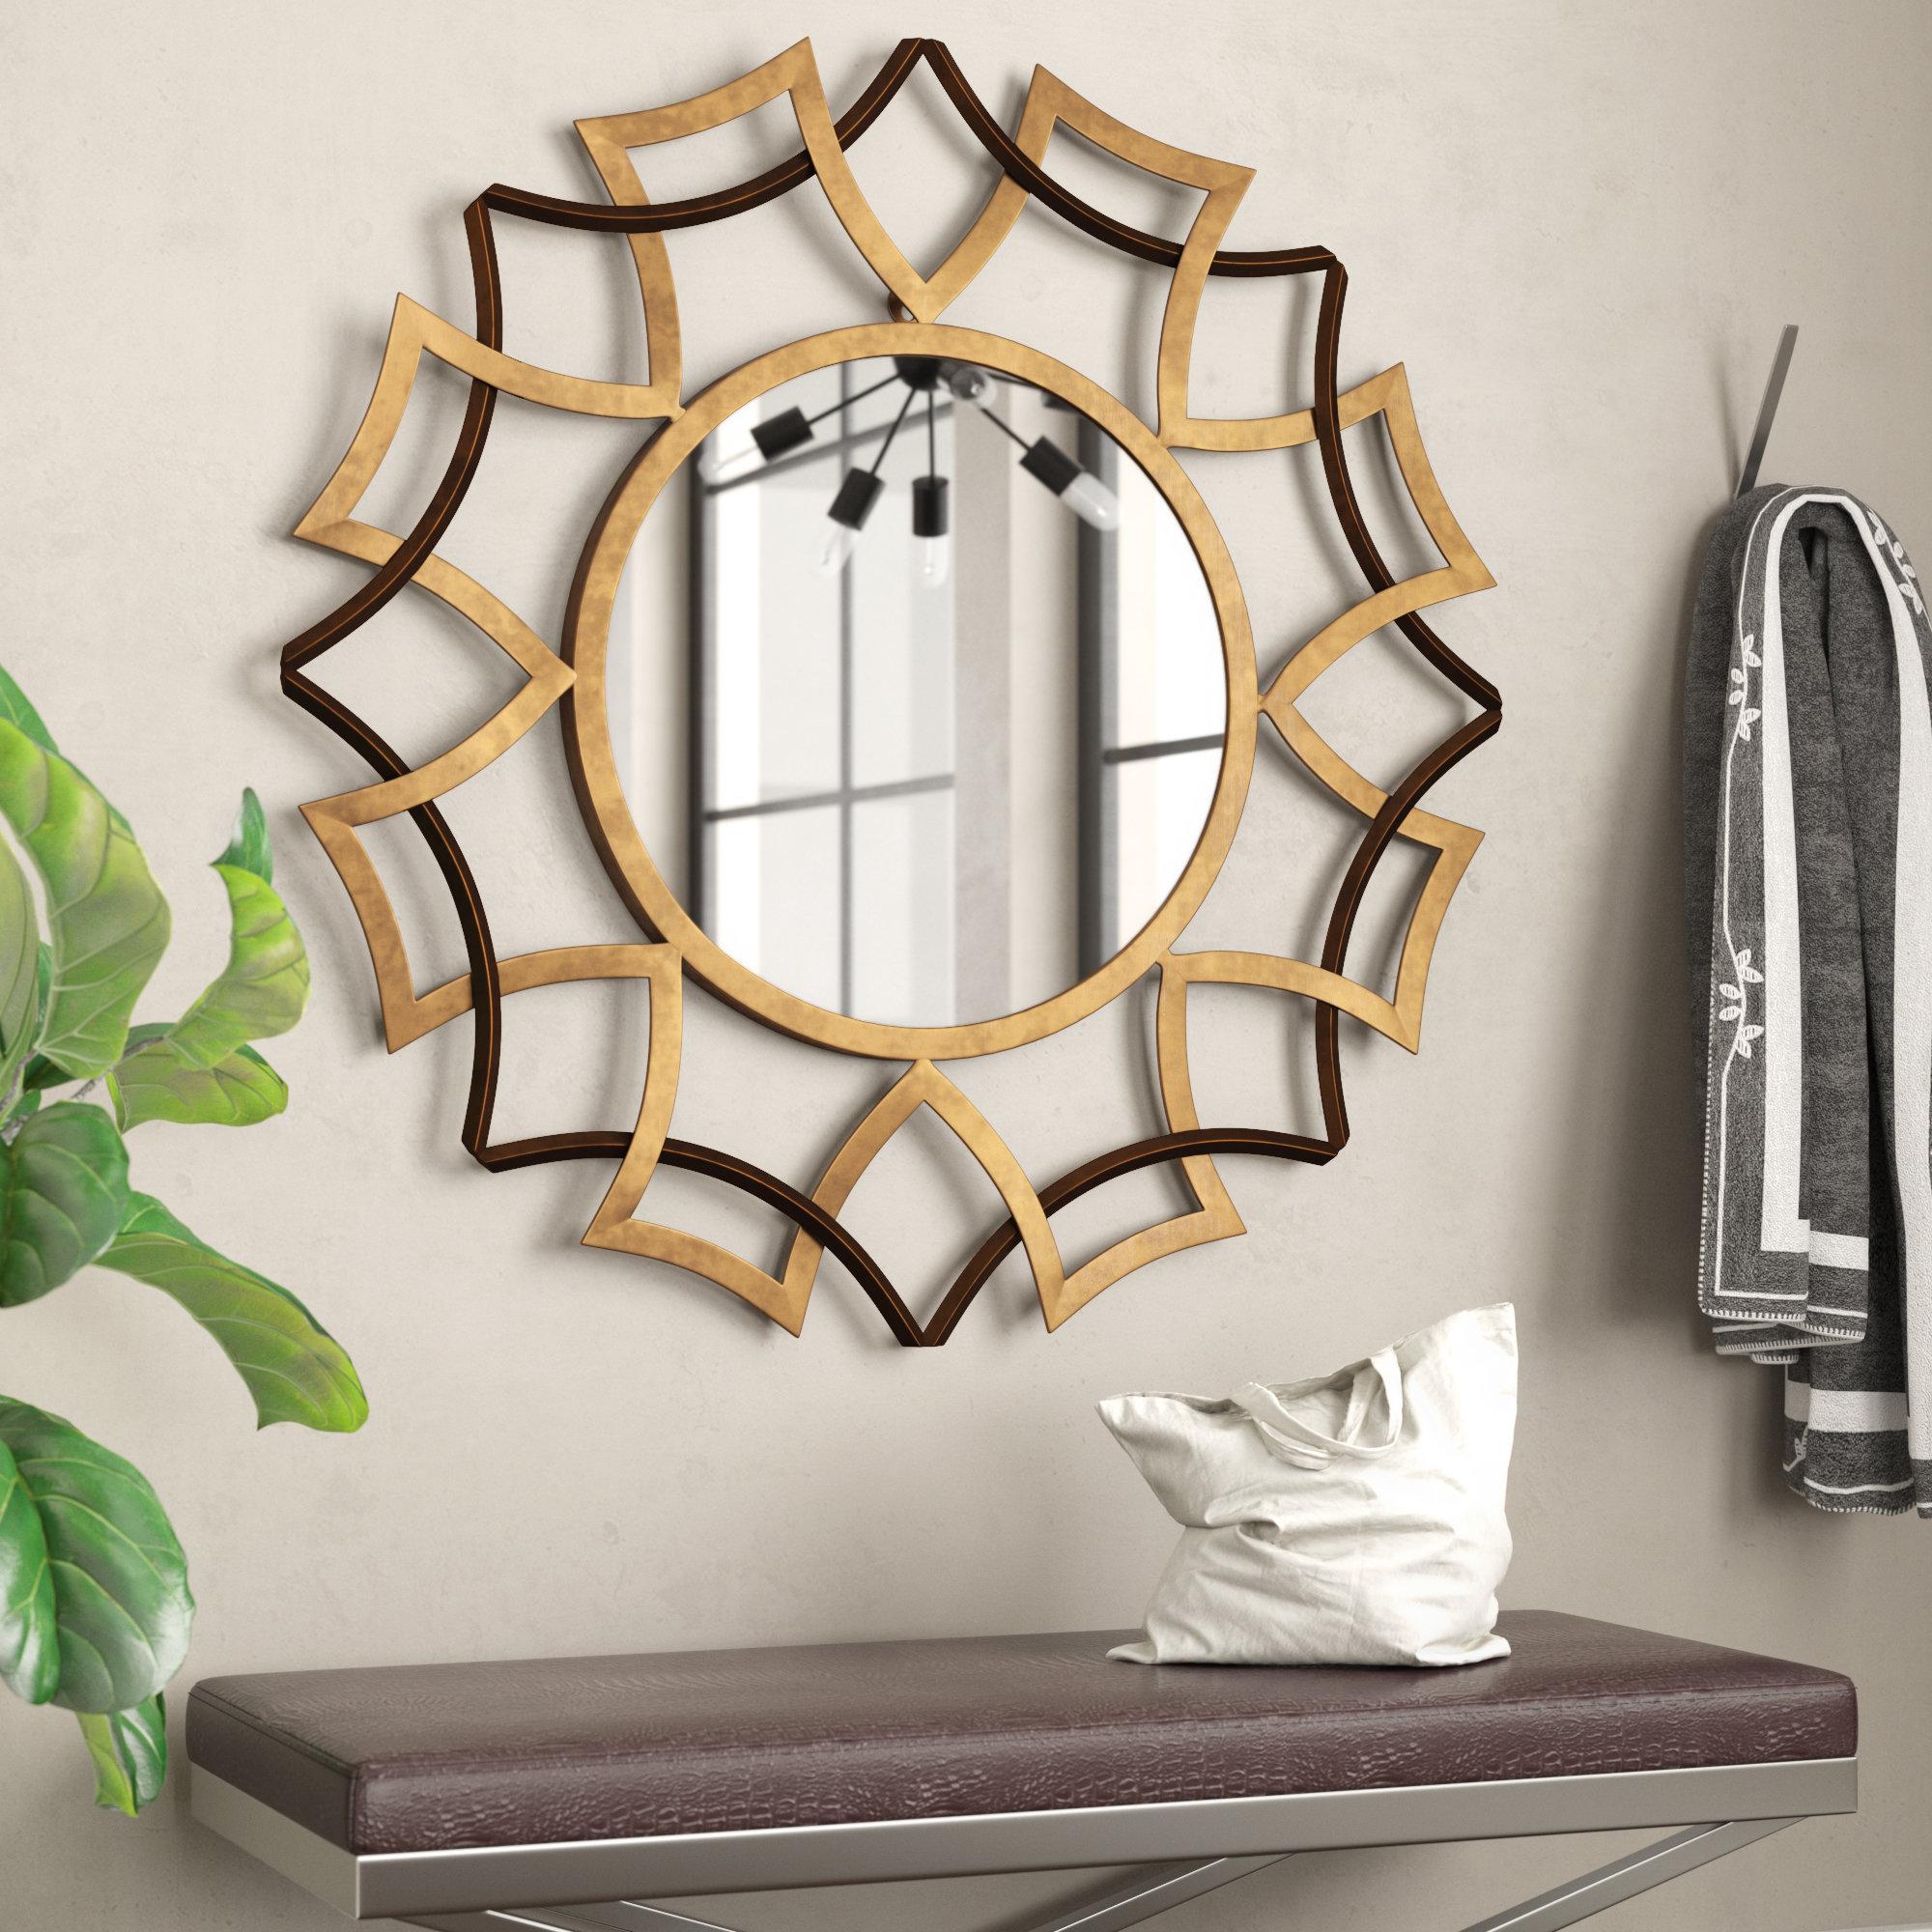 Sunburst Wall Mirrors You'll Love In 2019 | Wayfair Pertaining To Estrela Modern Sunburst Metal Wall Mirrors (View 26 of 30)